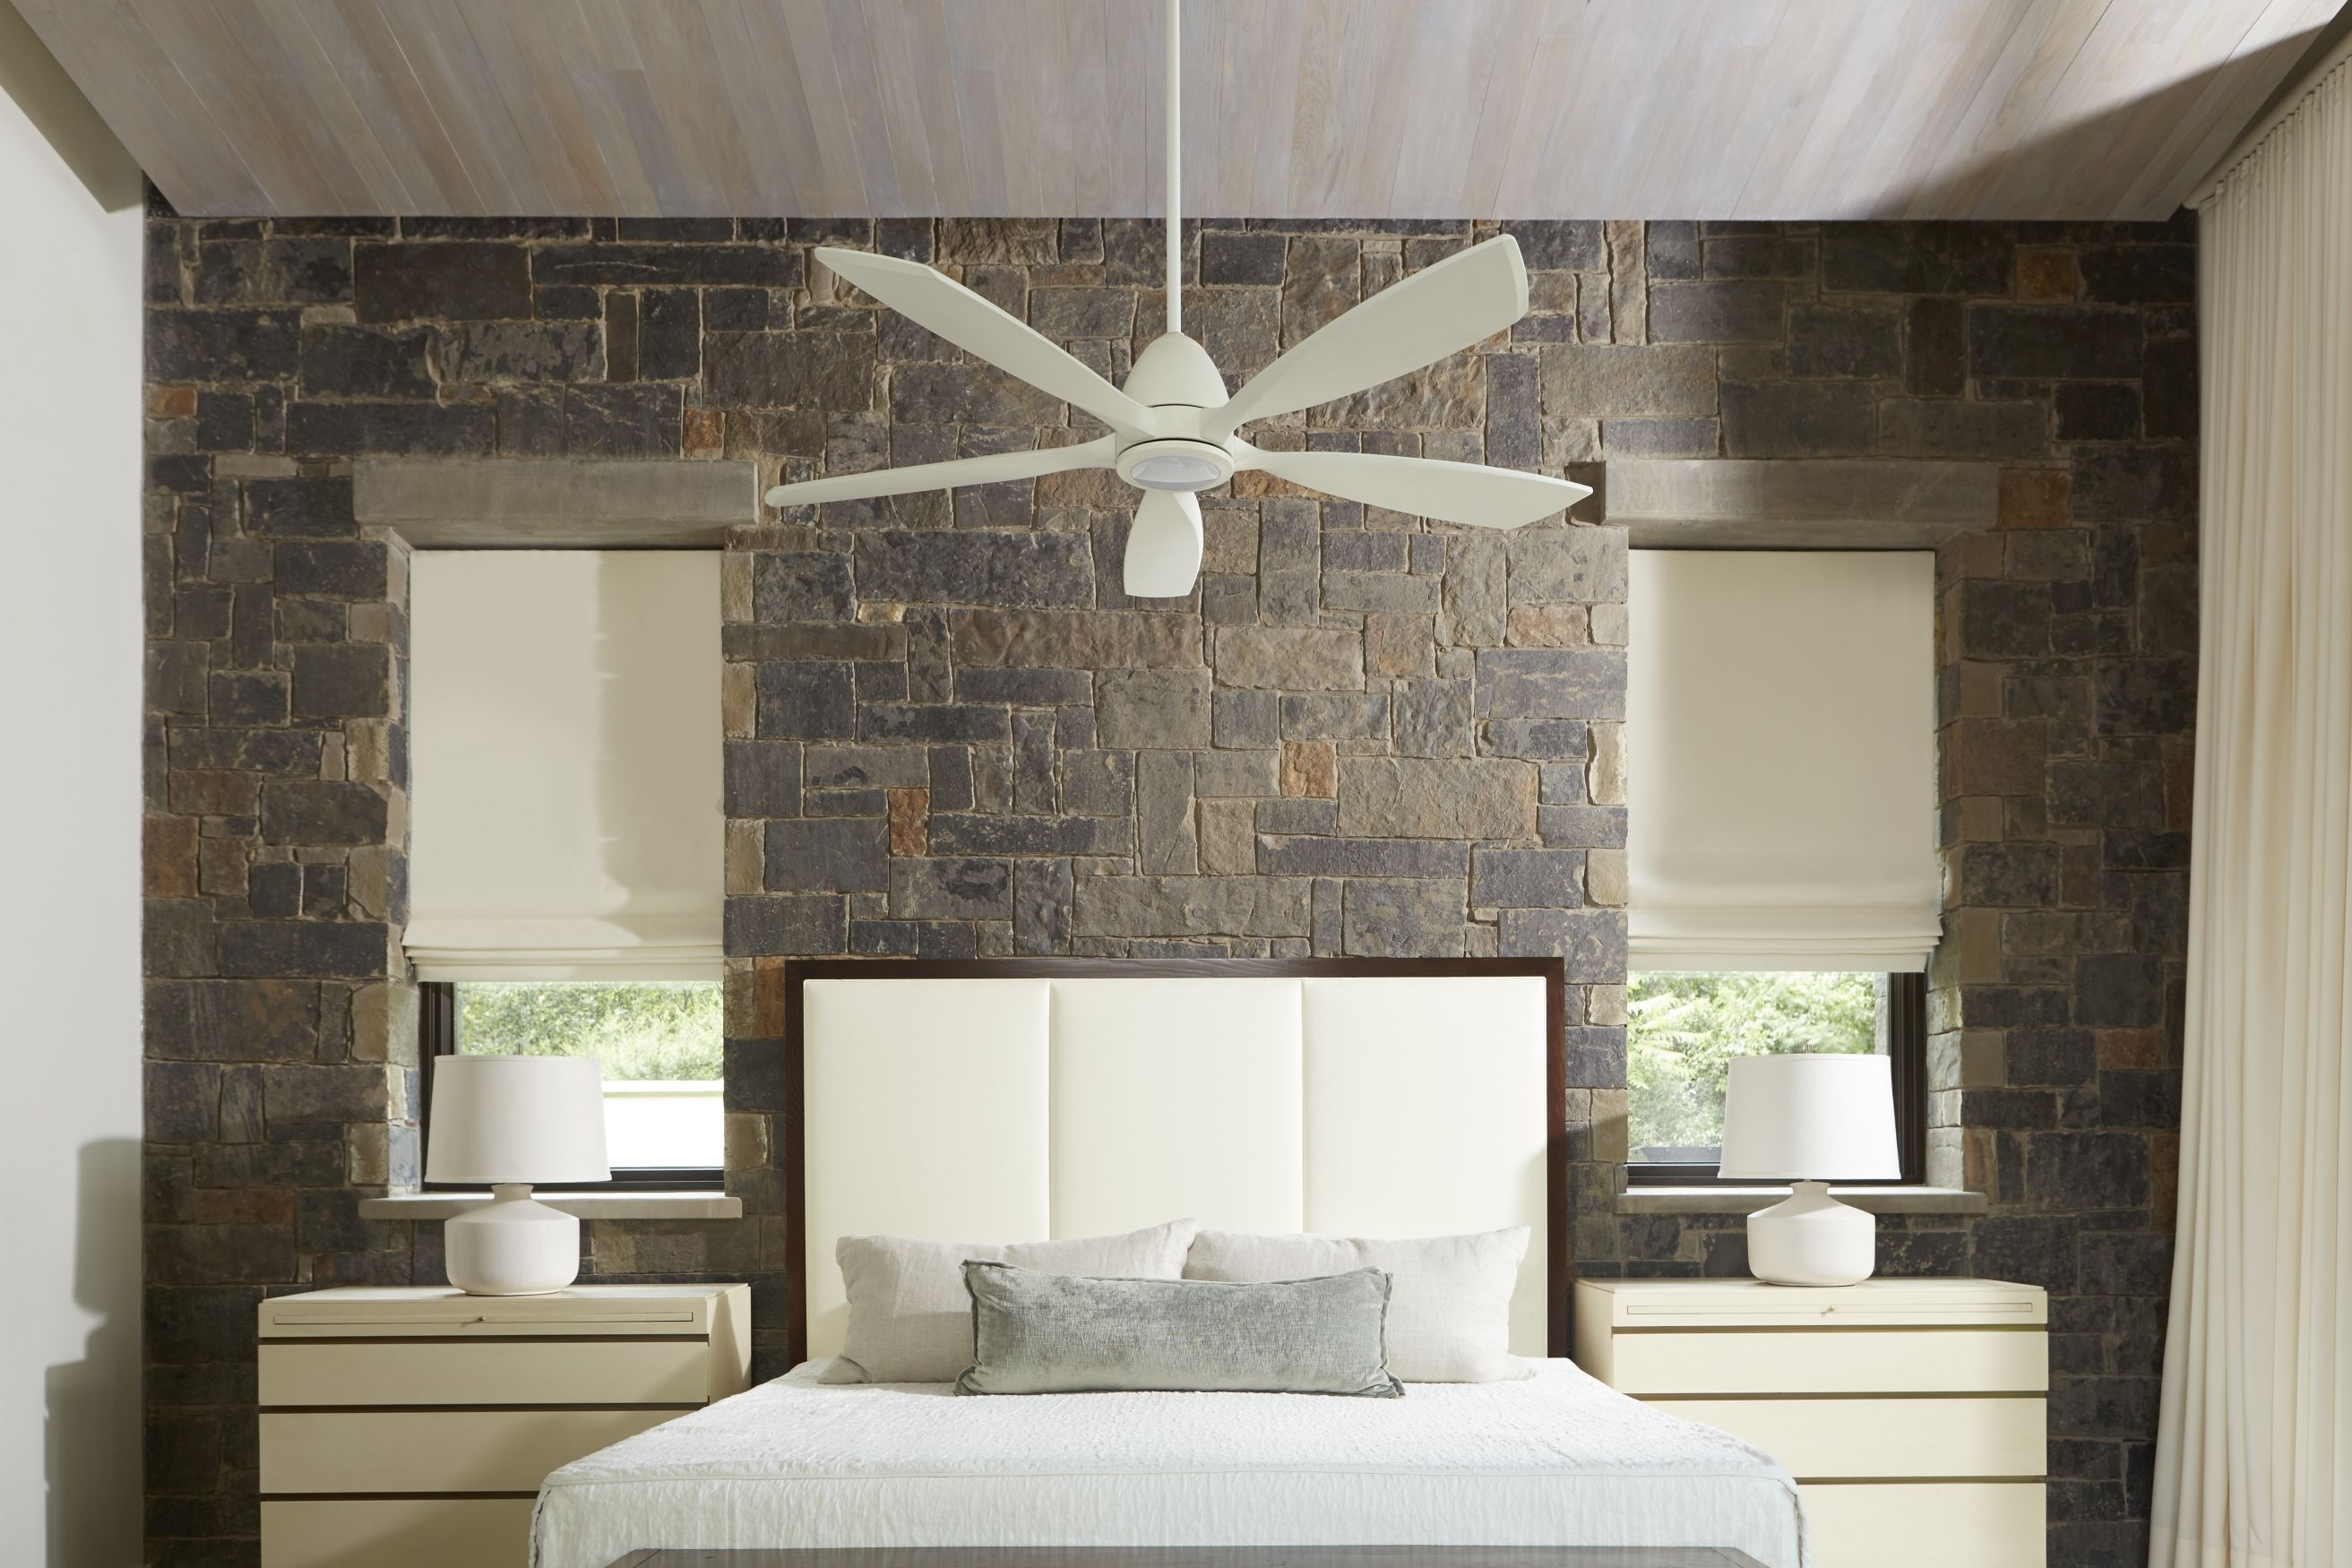 "Quorum Holt 56"" 5 Blade LED Indoor Ceiling Fan in Studio White"